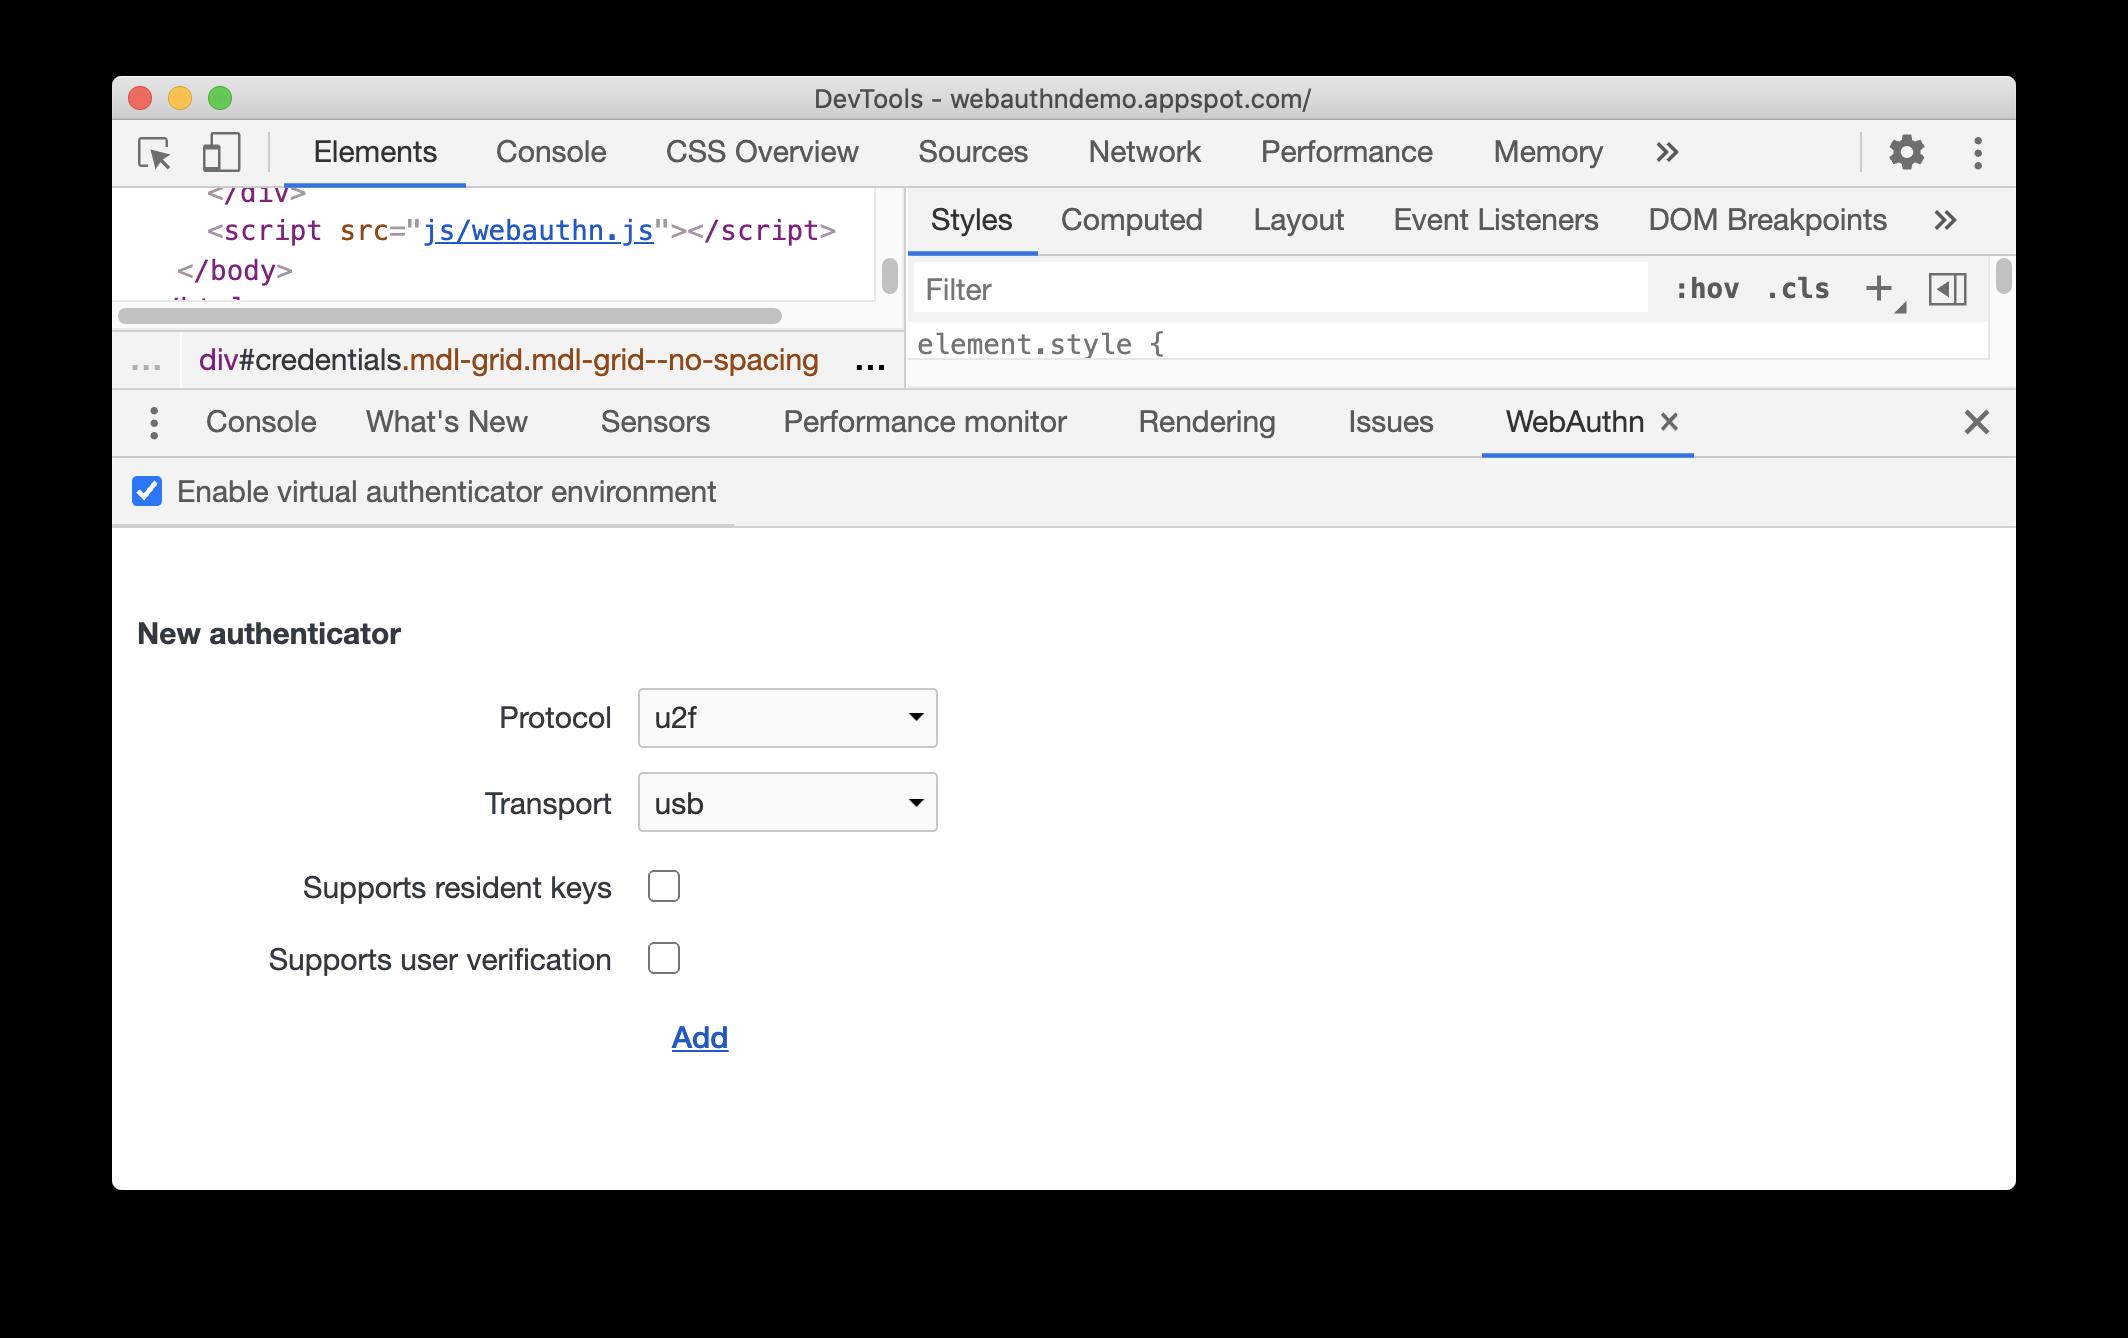 Enable virtual authenticator environment